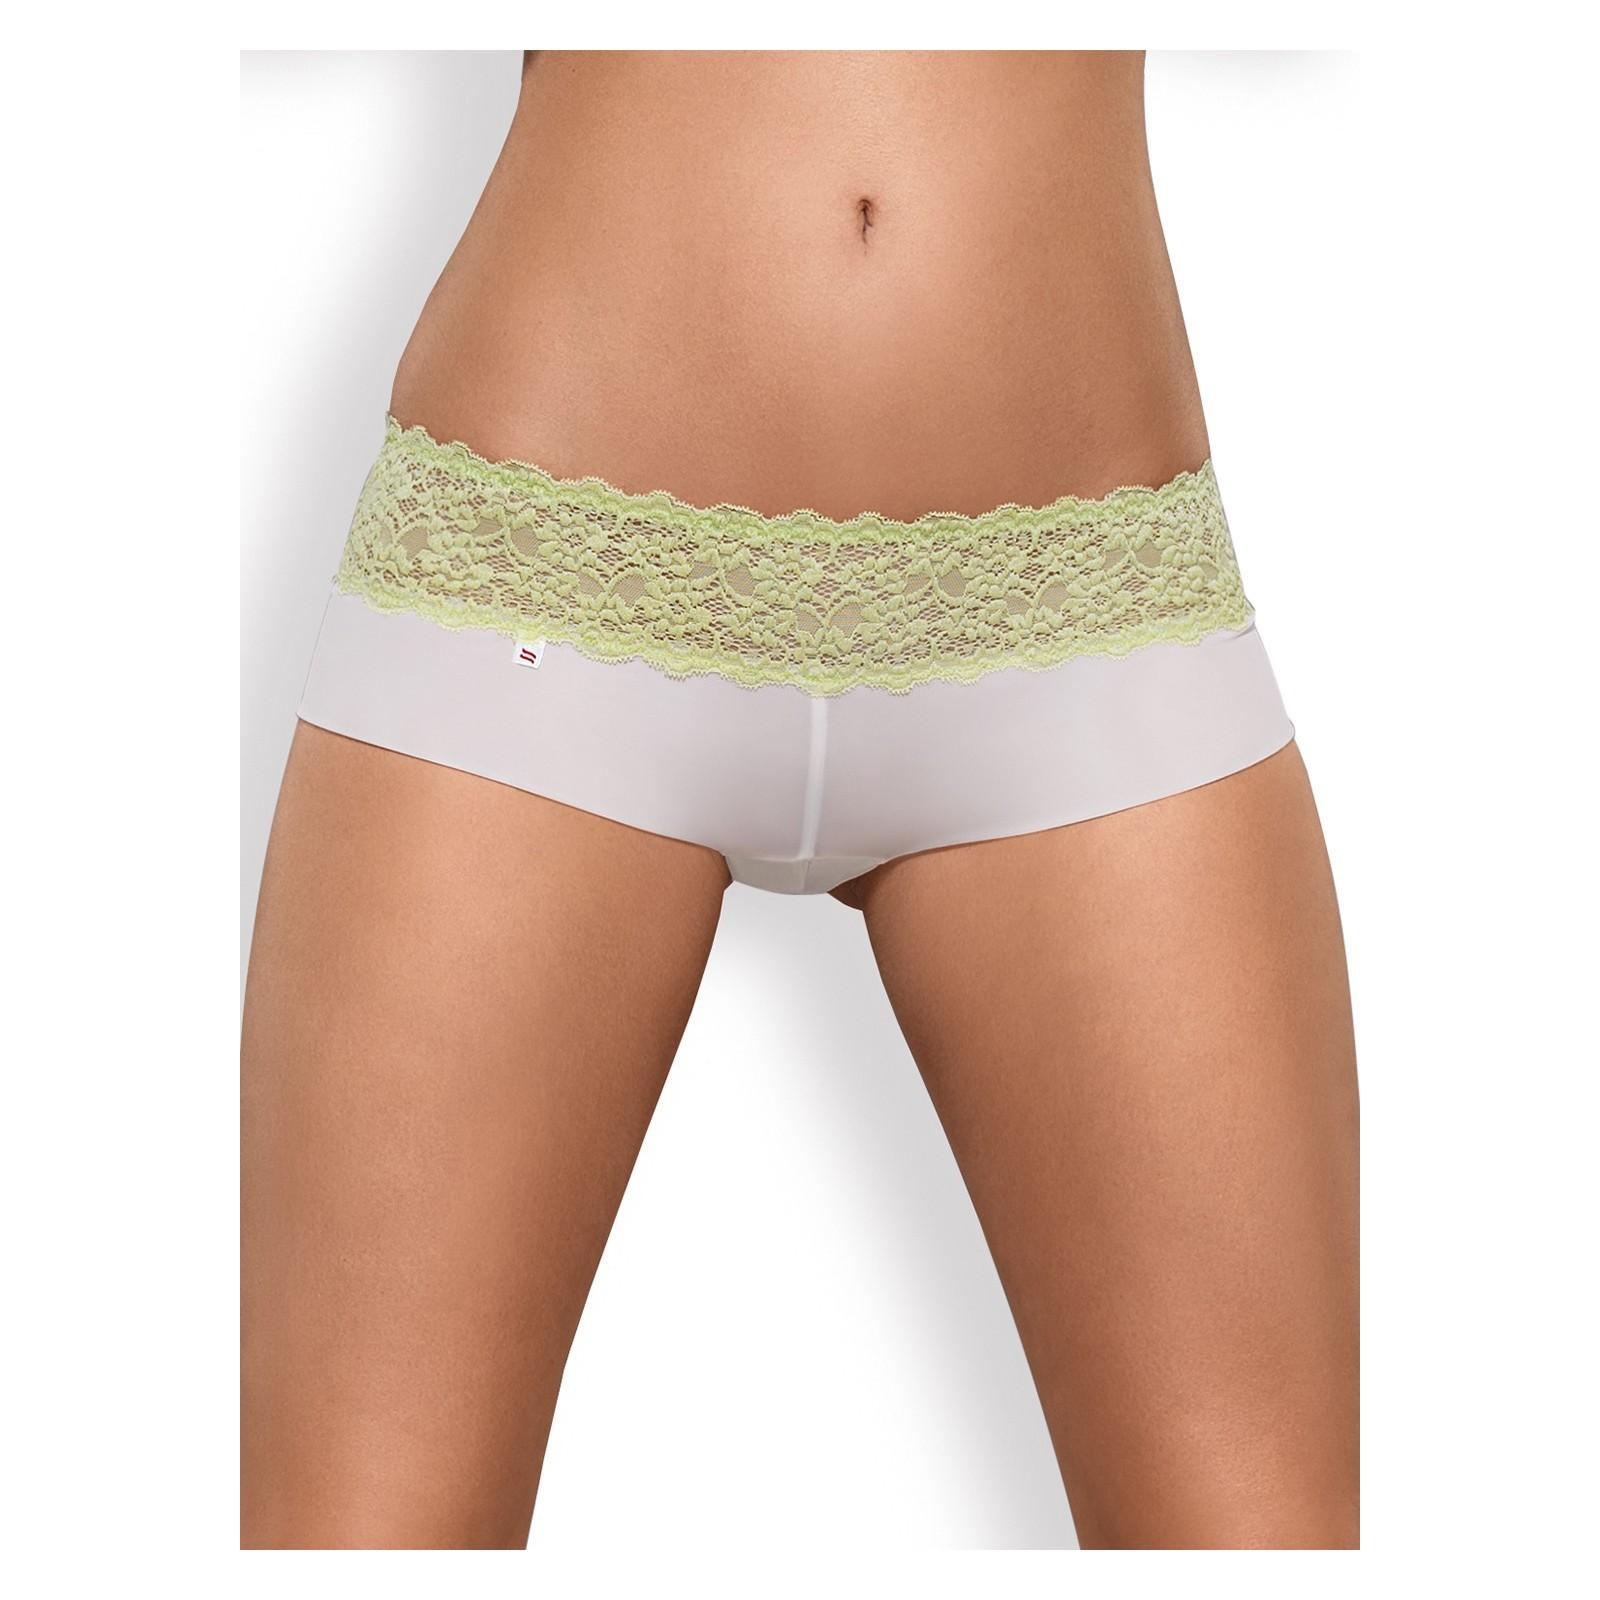 Lacea Shorties & String Duopack grün - 6 - Vorschaubild